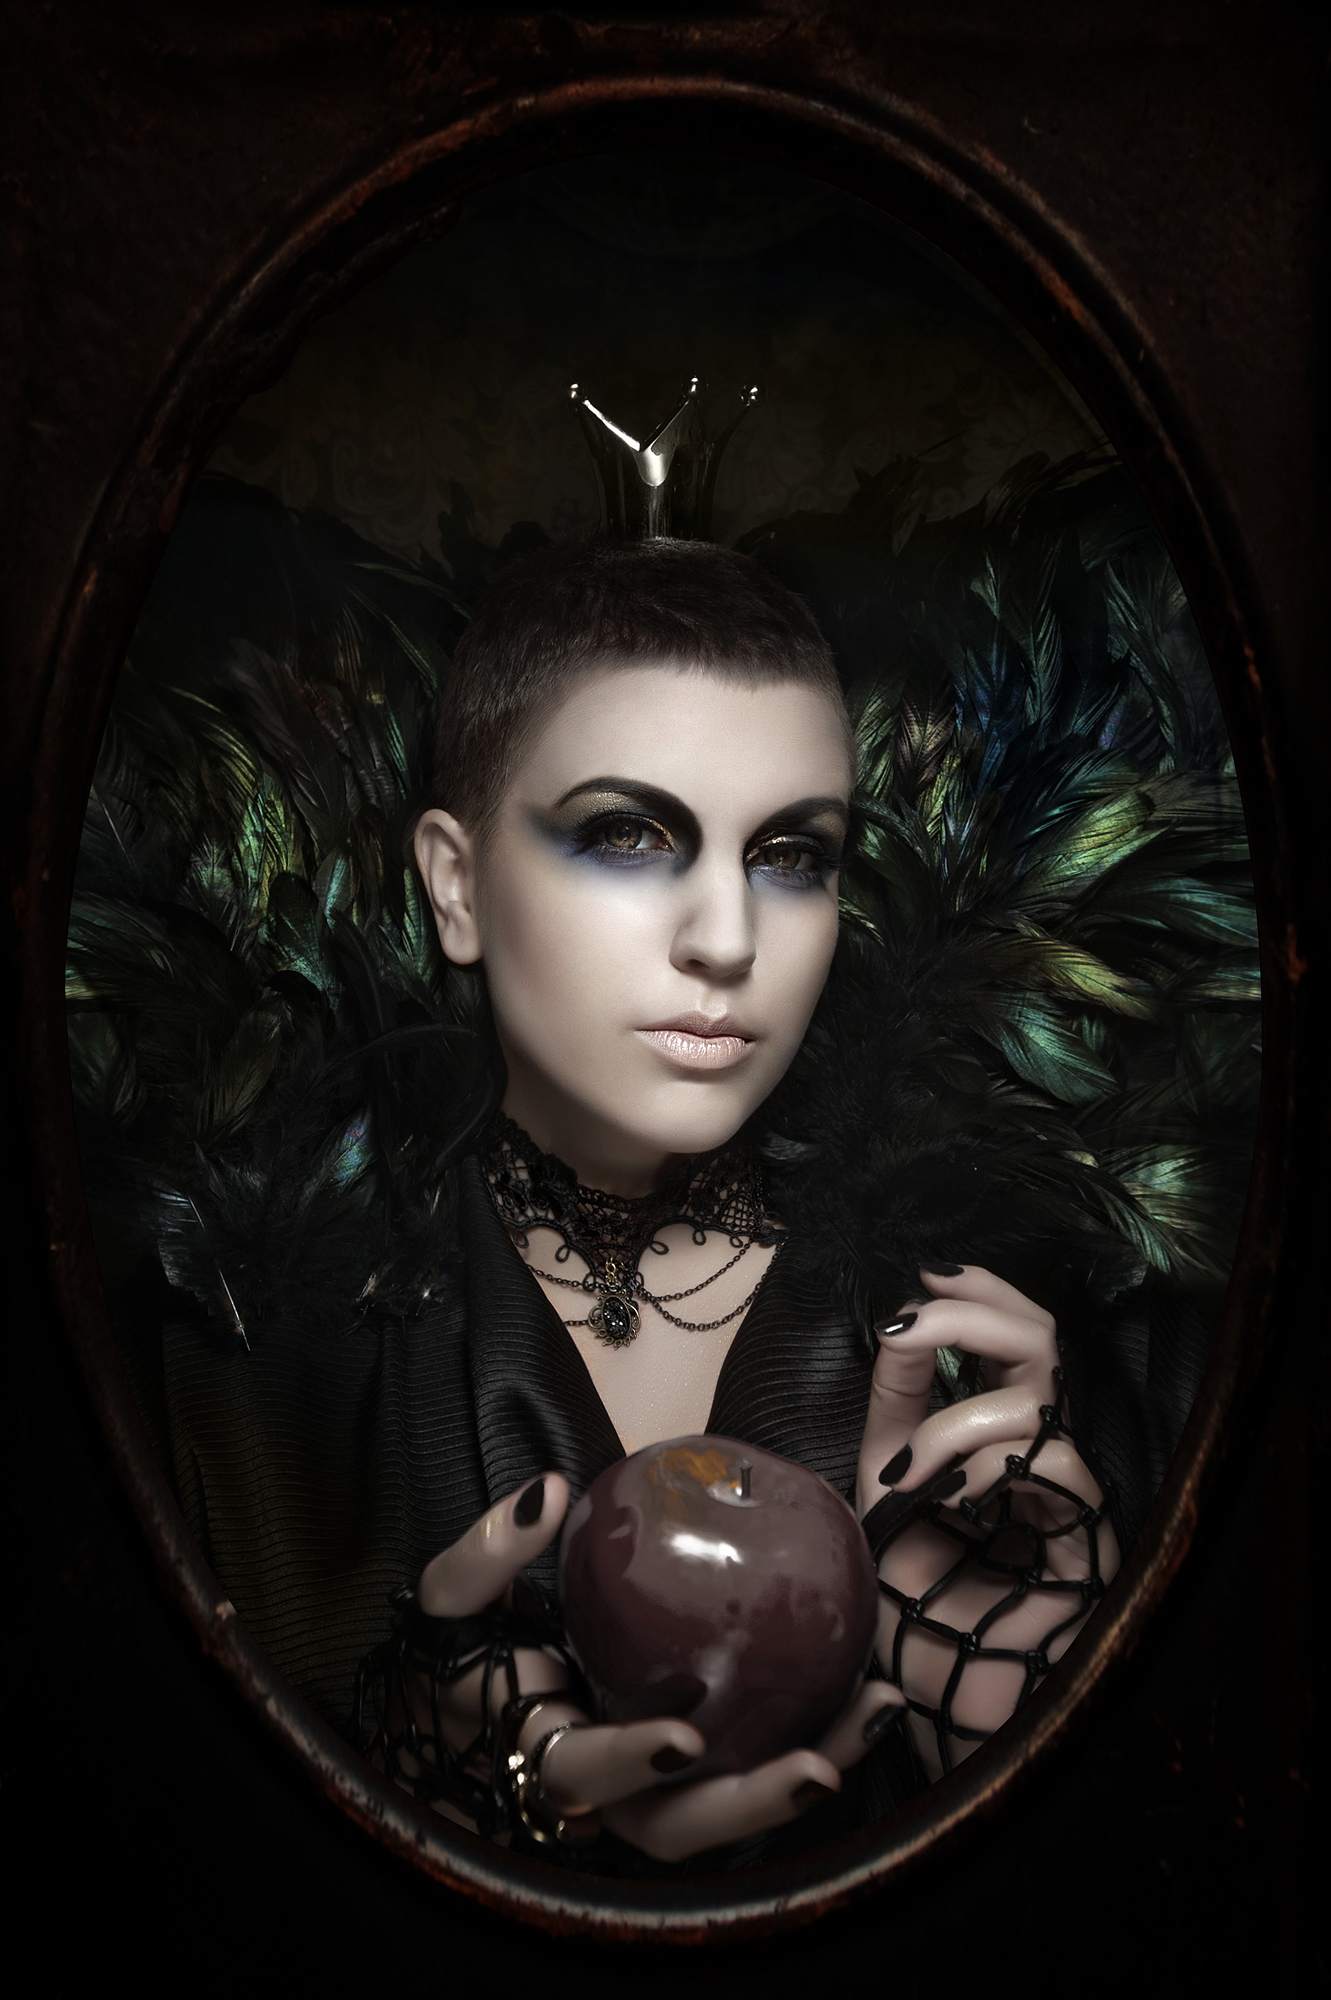 Sylwia Makris - Adea Shabani - hair makeup and stylist Moni Gutezeit